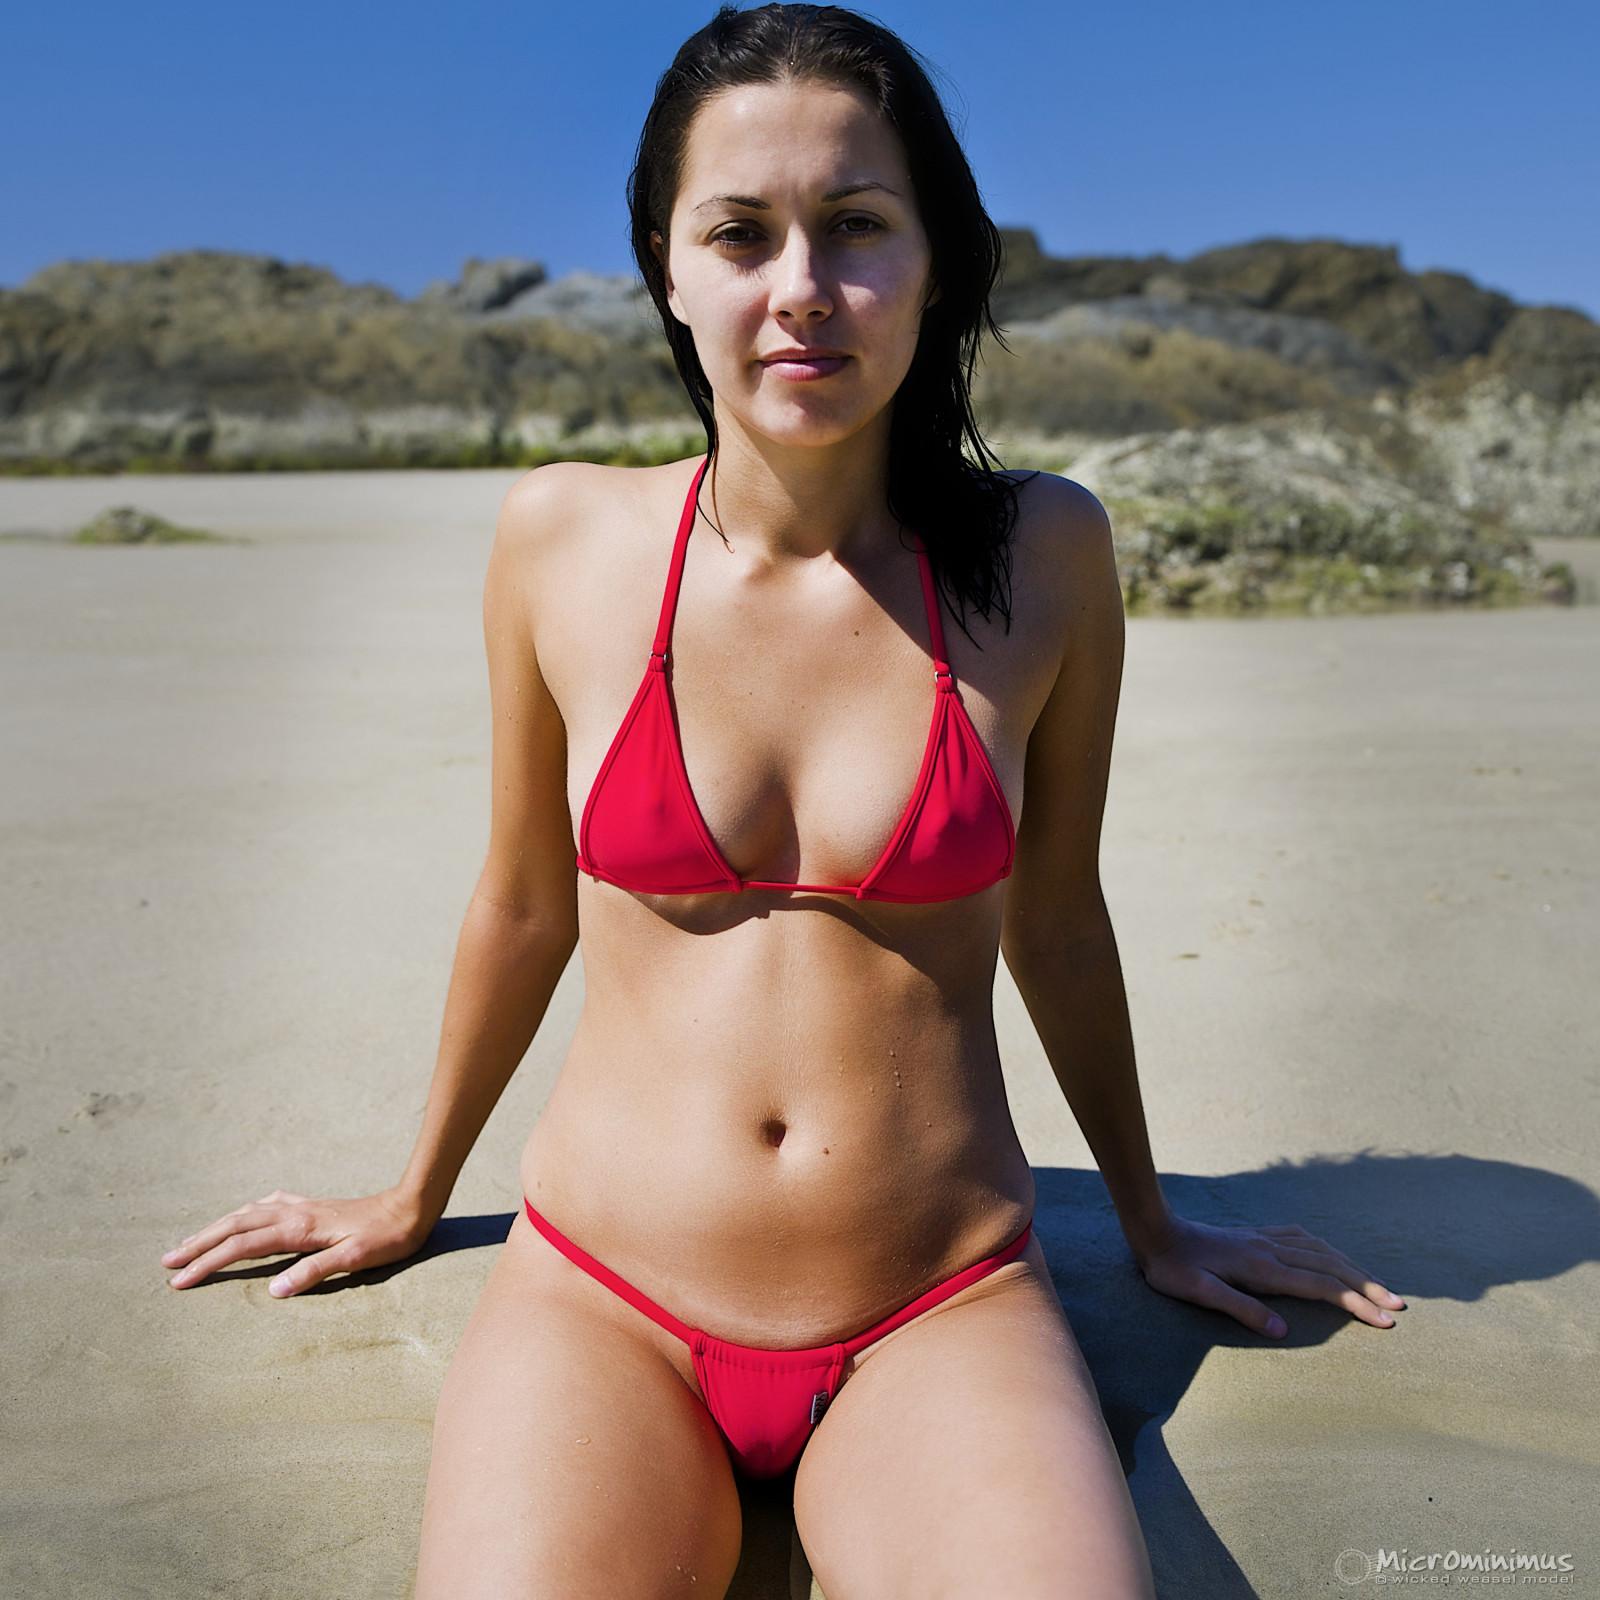 Fondos De Pantalla : Mujer, Modelo, Morena, Playa, Bikinis